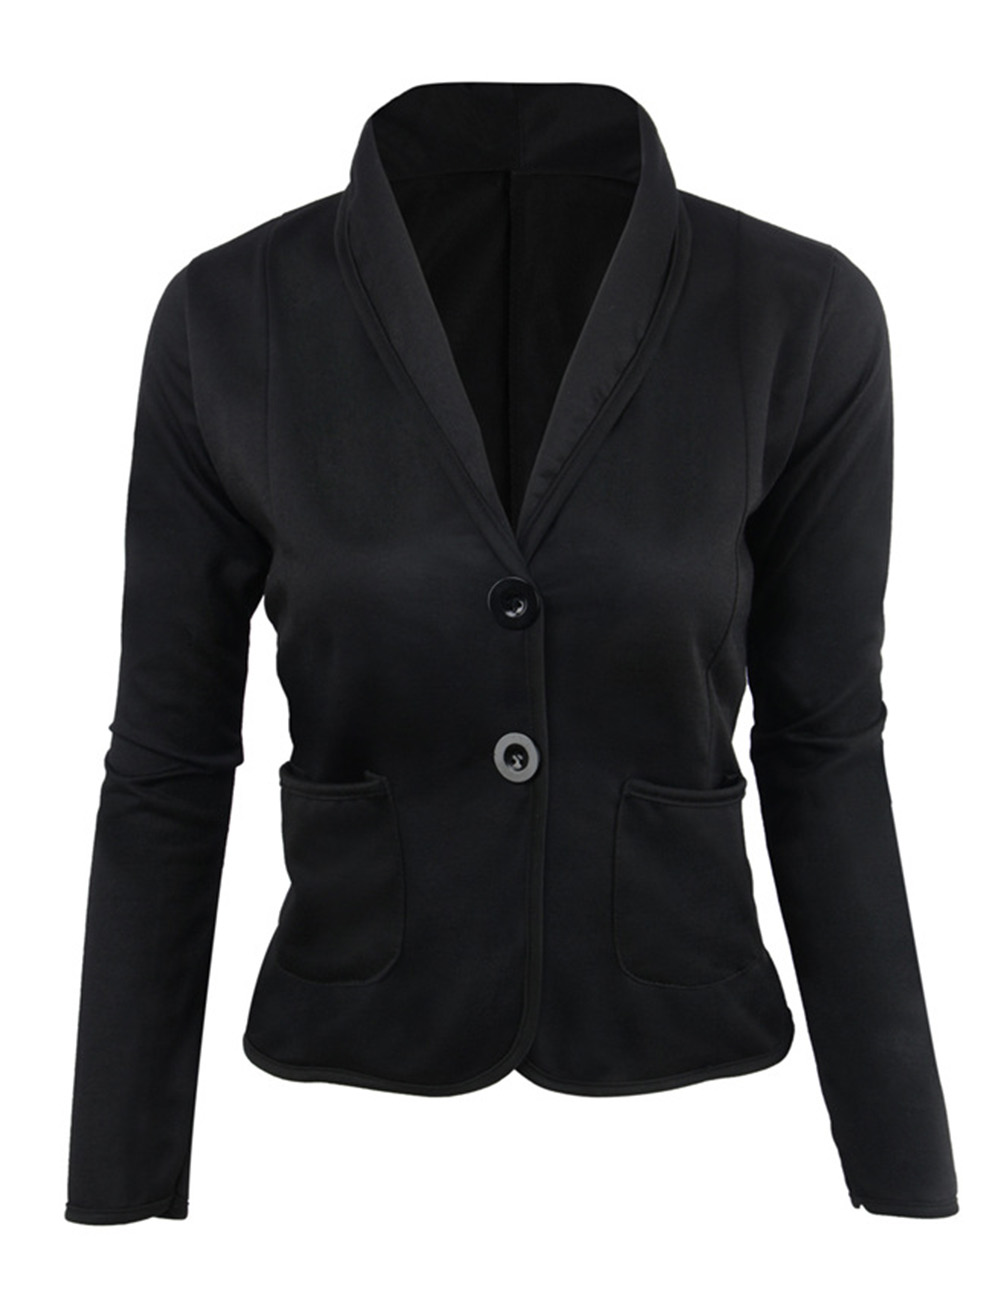 Women Fashion Lapels Design Jackets Small Type Matching Suit Coat Double Button Placket Tops